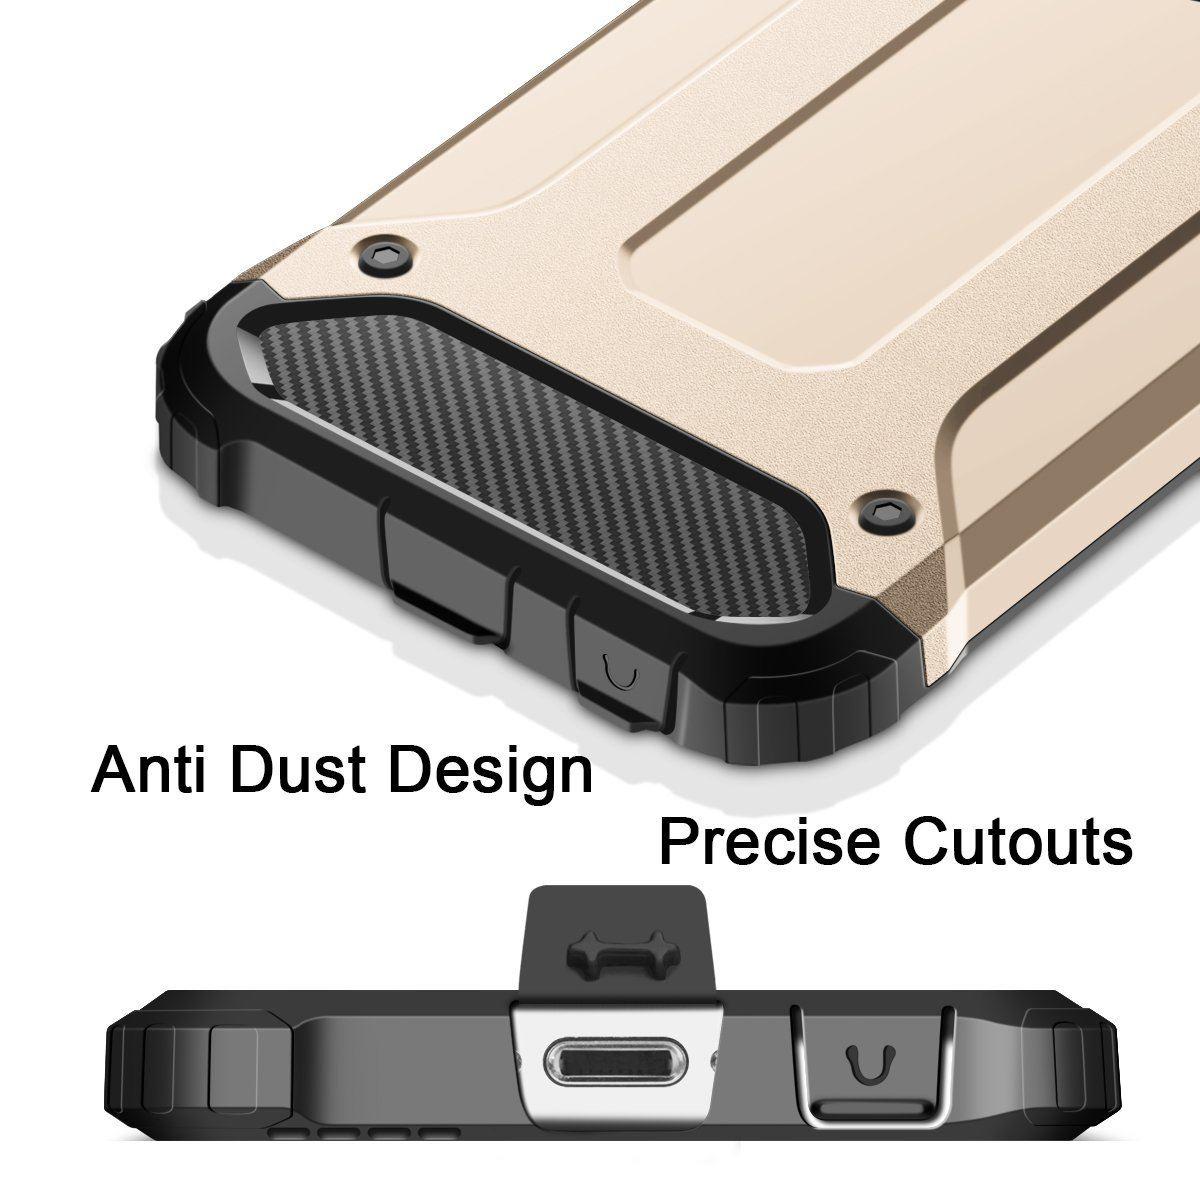 thumbnail 69 - For Apple iPhone 11 Pro Max XR Xs X 8 7 Plus 6 5 Se Case Cover Impact Heavy Duty